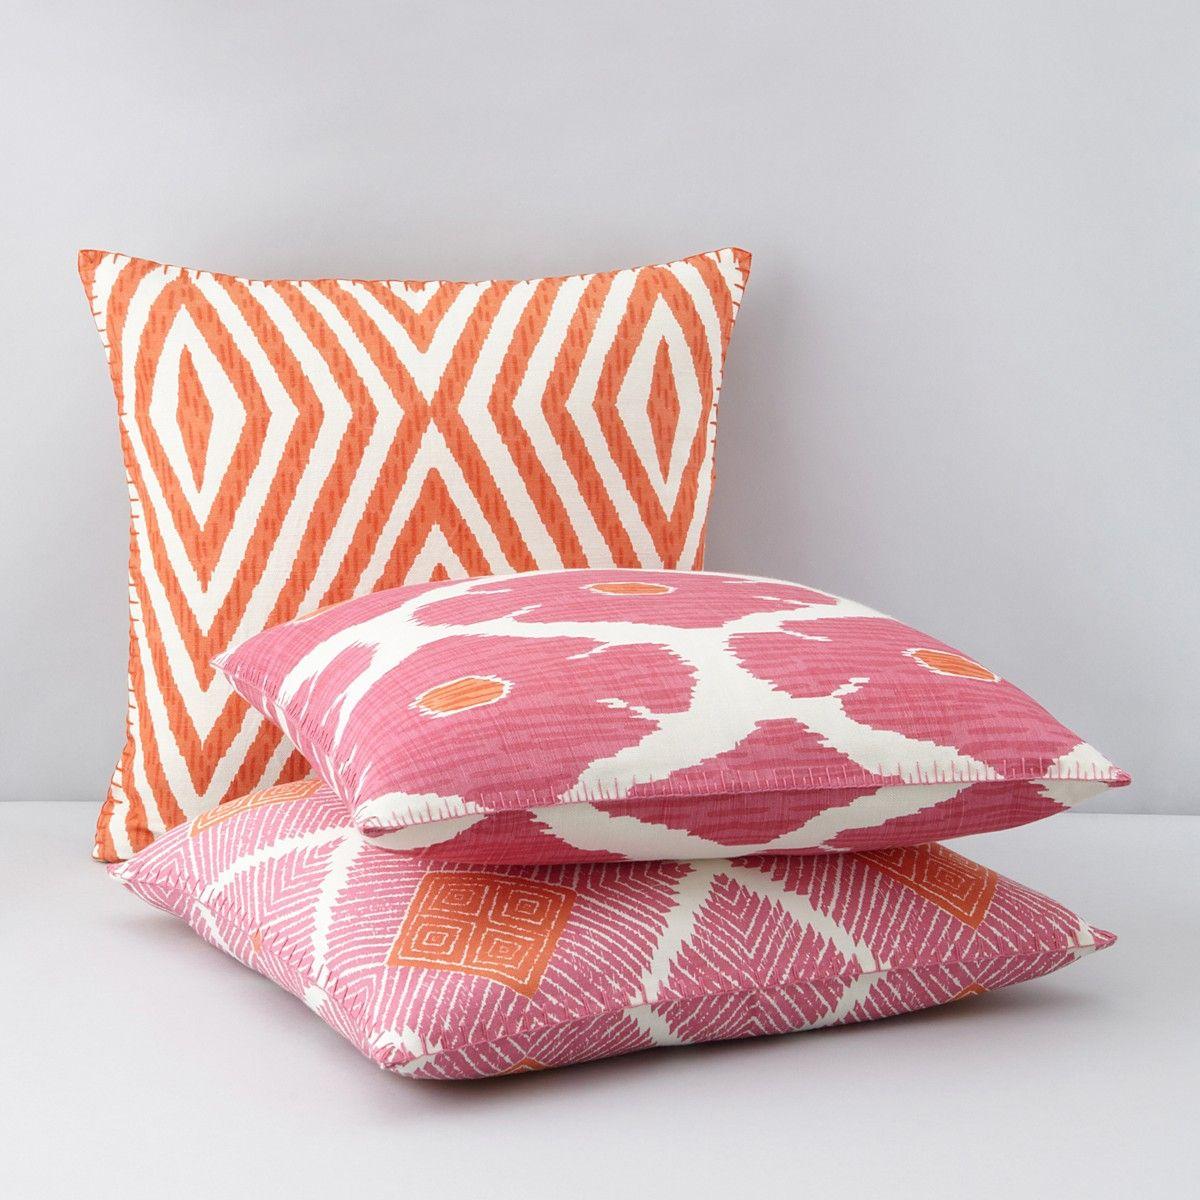 JR by John Robshaw Poppy Lotus Decorative Pillows